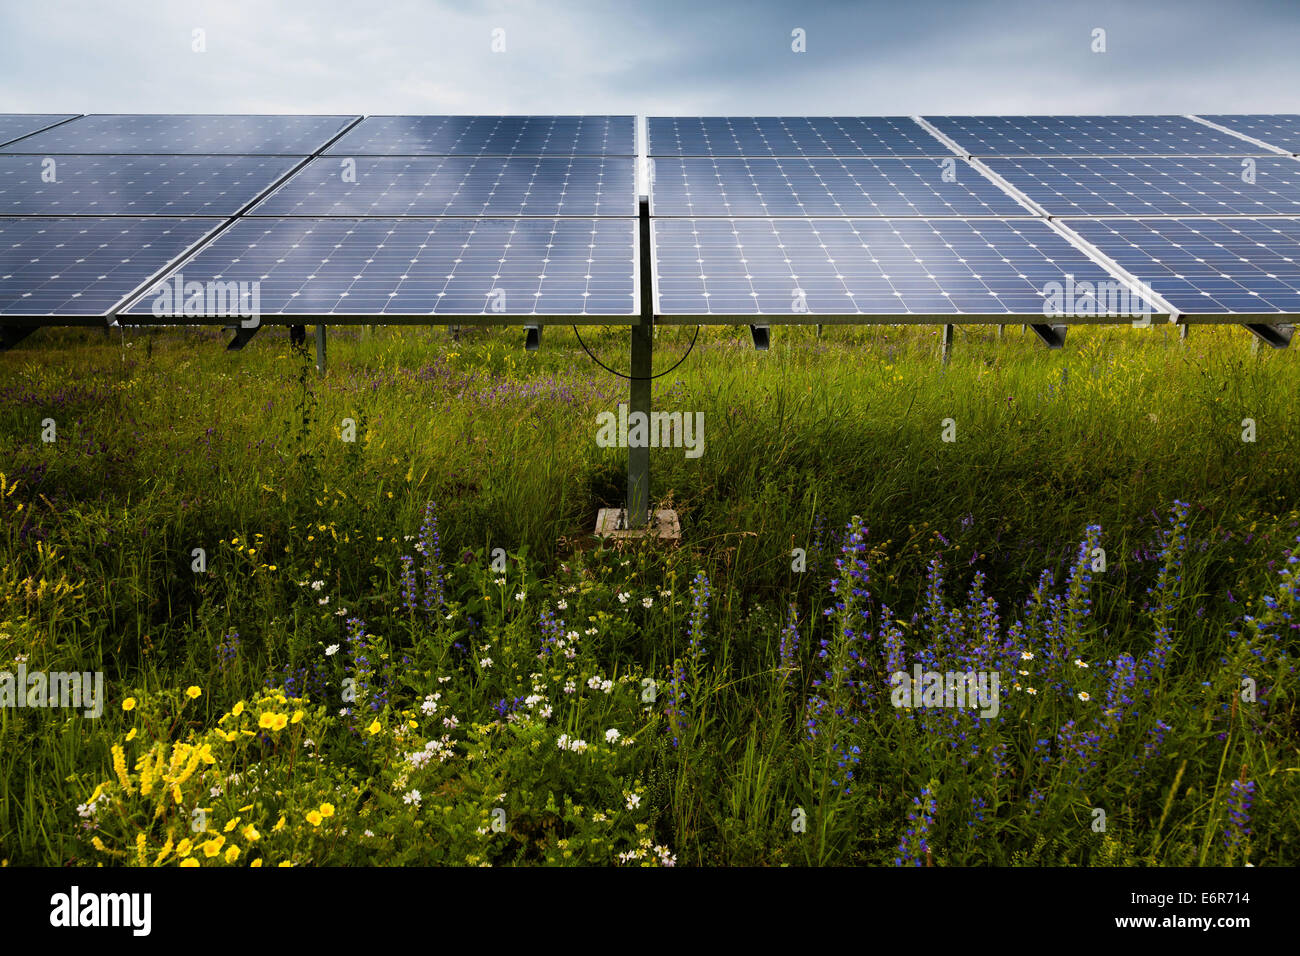 Power plant using renewable solar energy - Stock Image